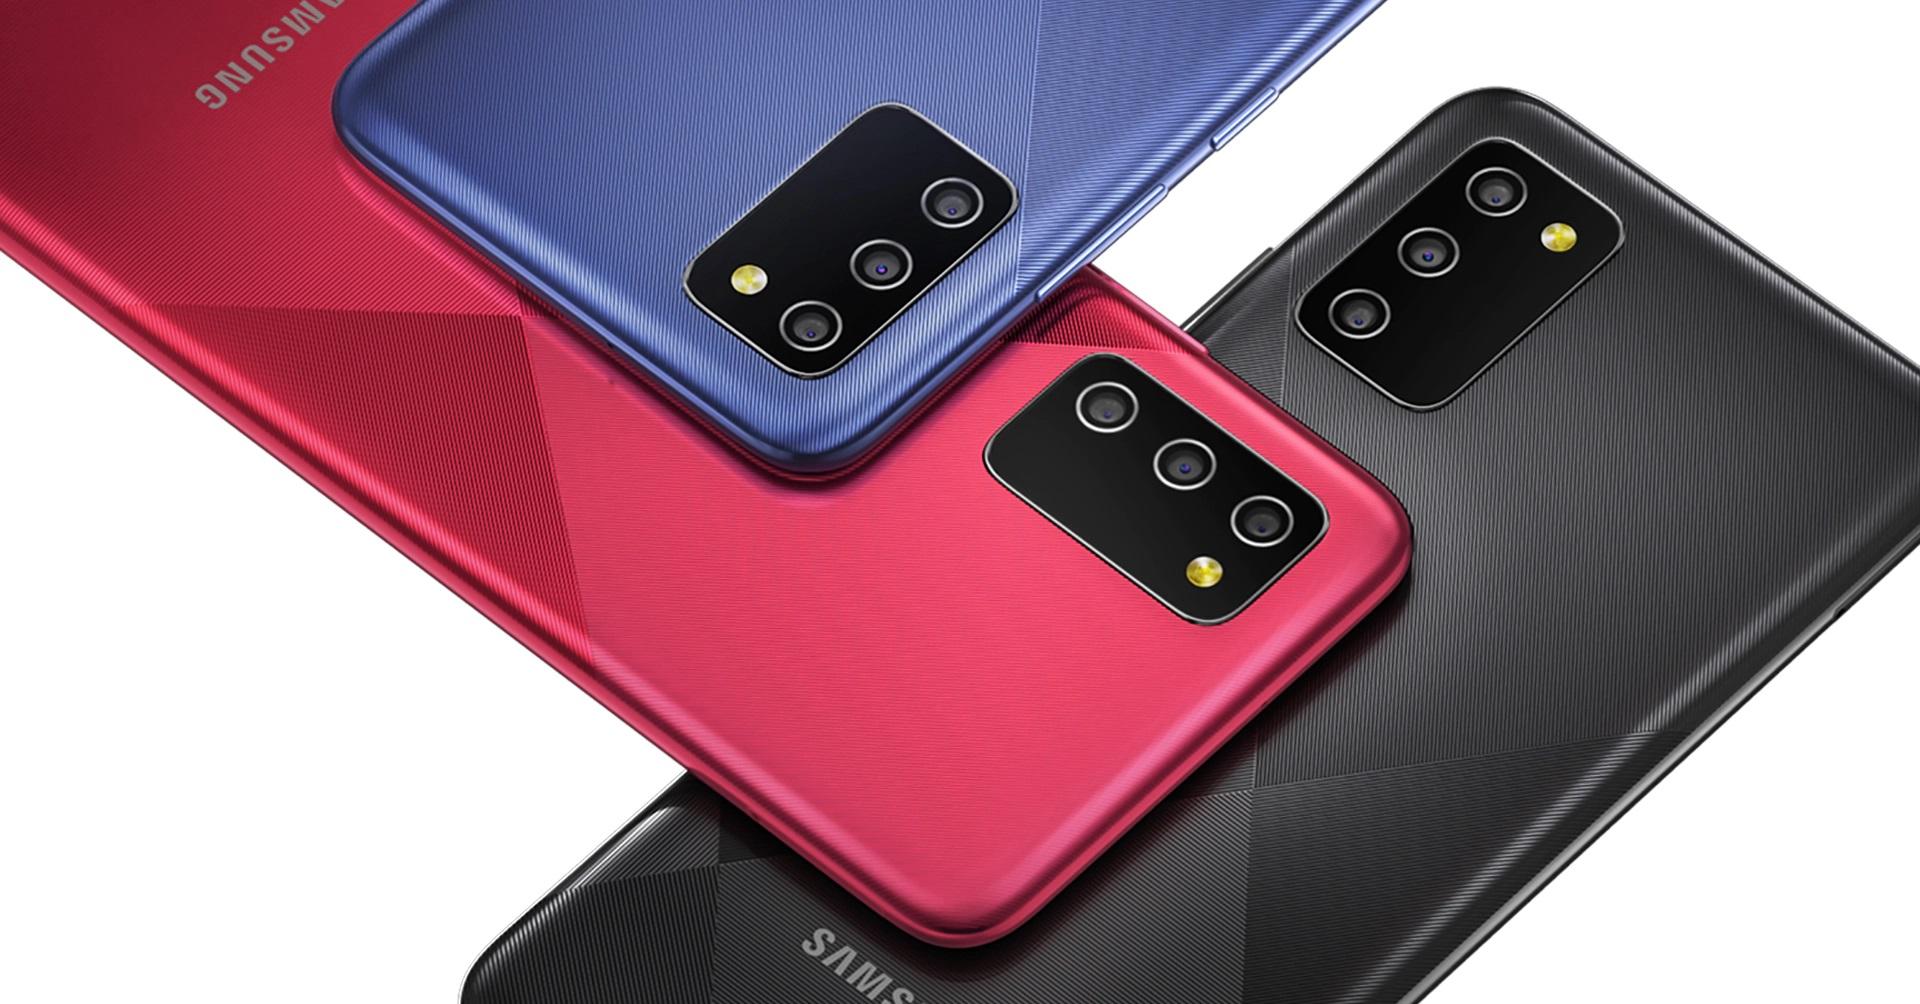 Samsung Galaxy M02s: бюджетник с аккумулятором на 5000 мАч и Snapdragon 450 за $120